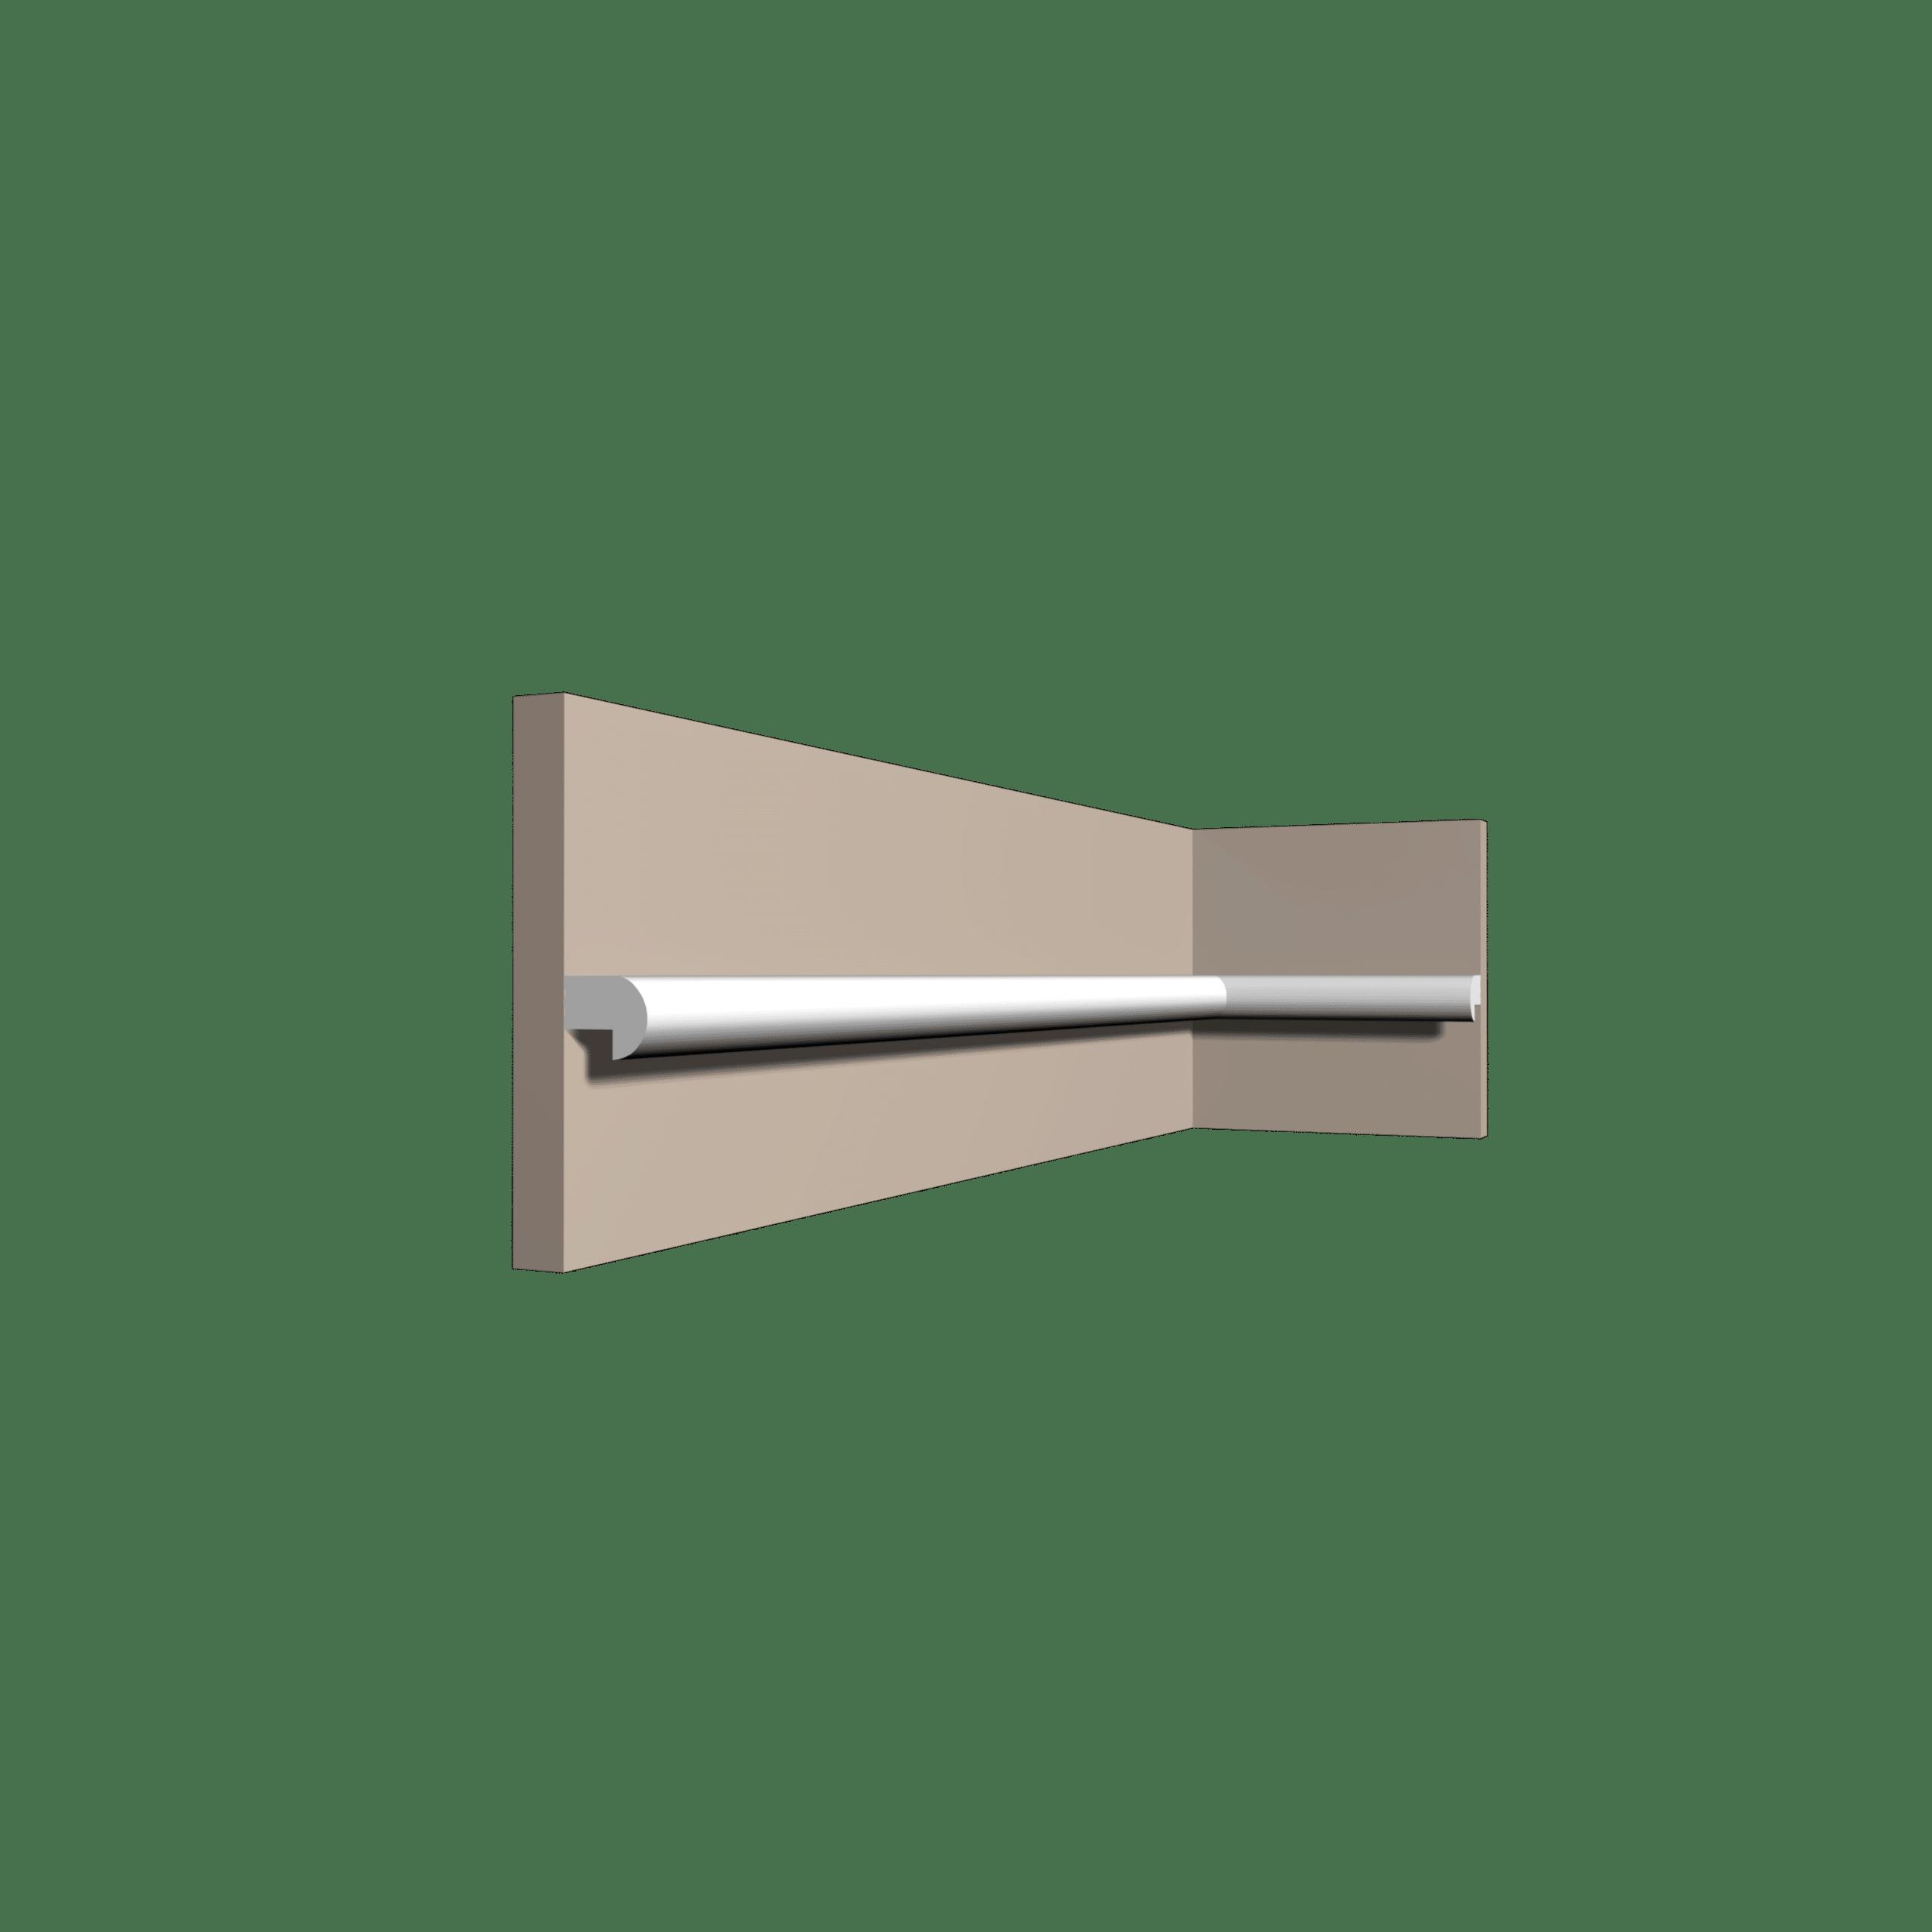 קרניז פוליאוריתן דגם DS - 2019